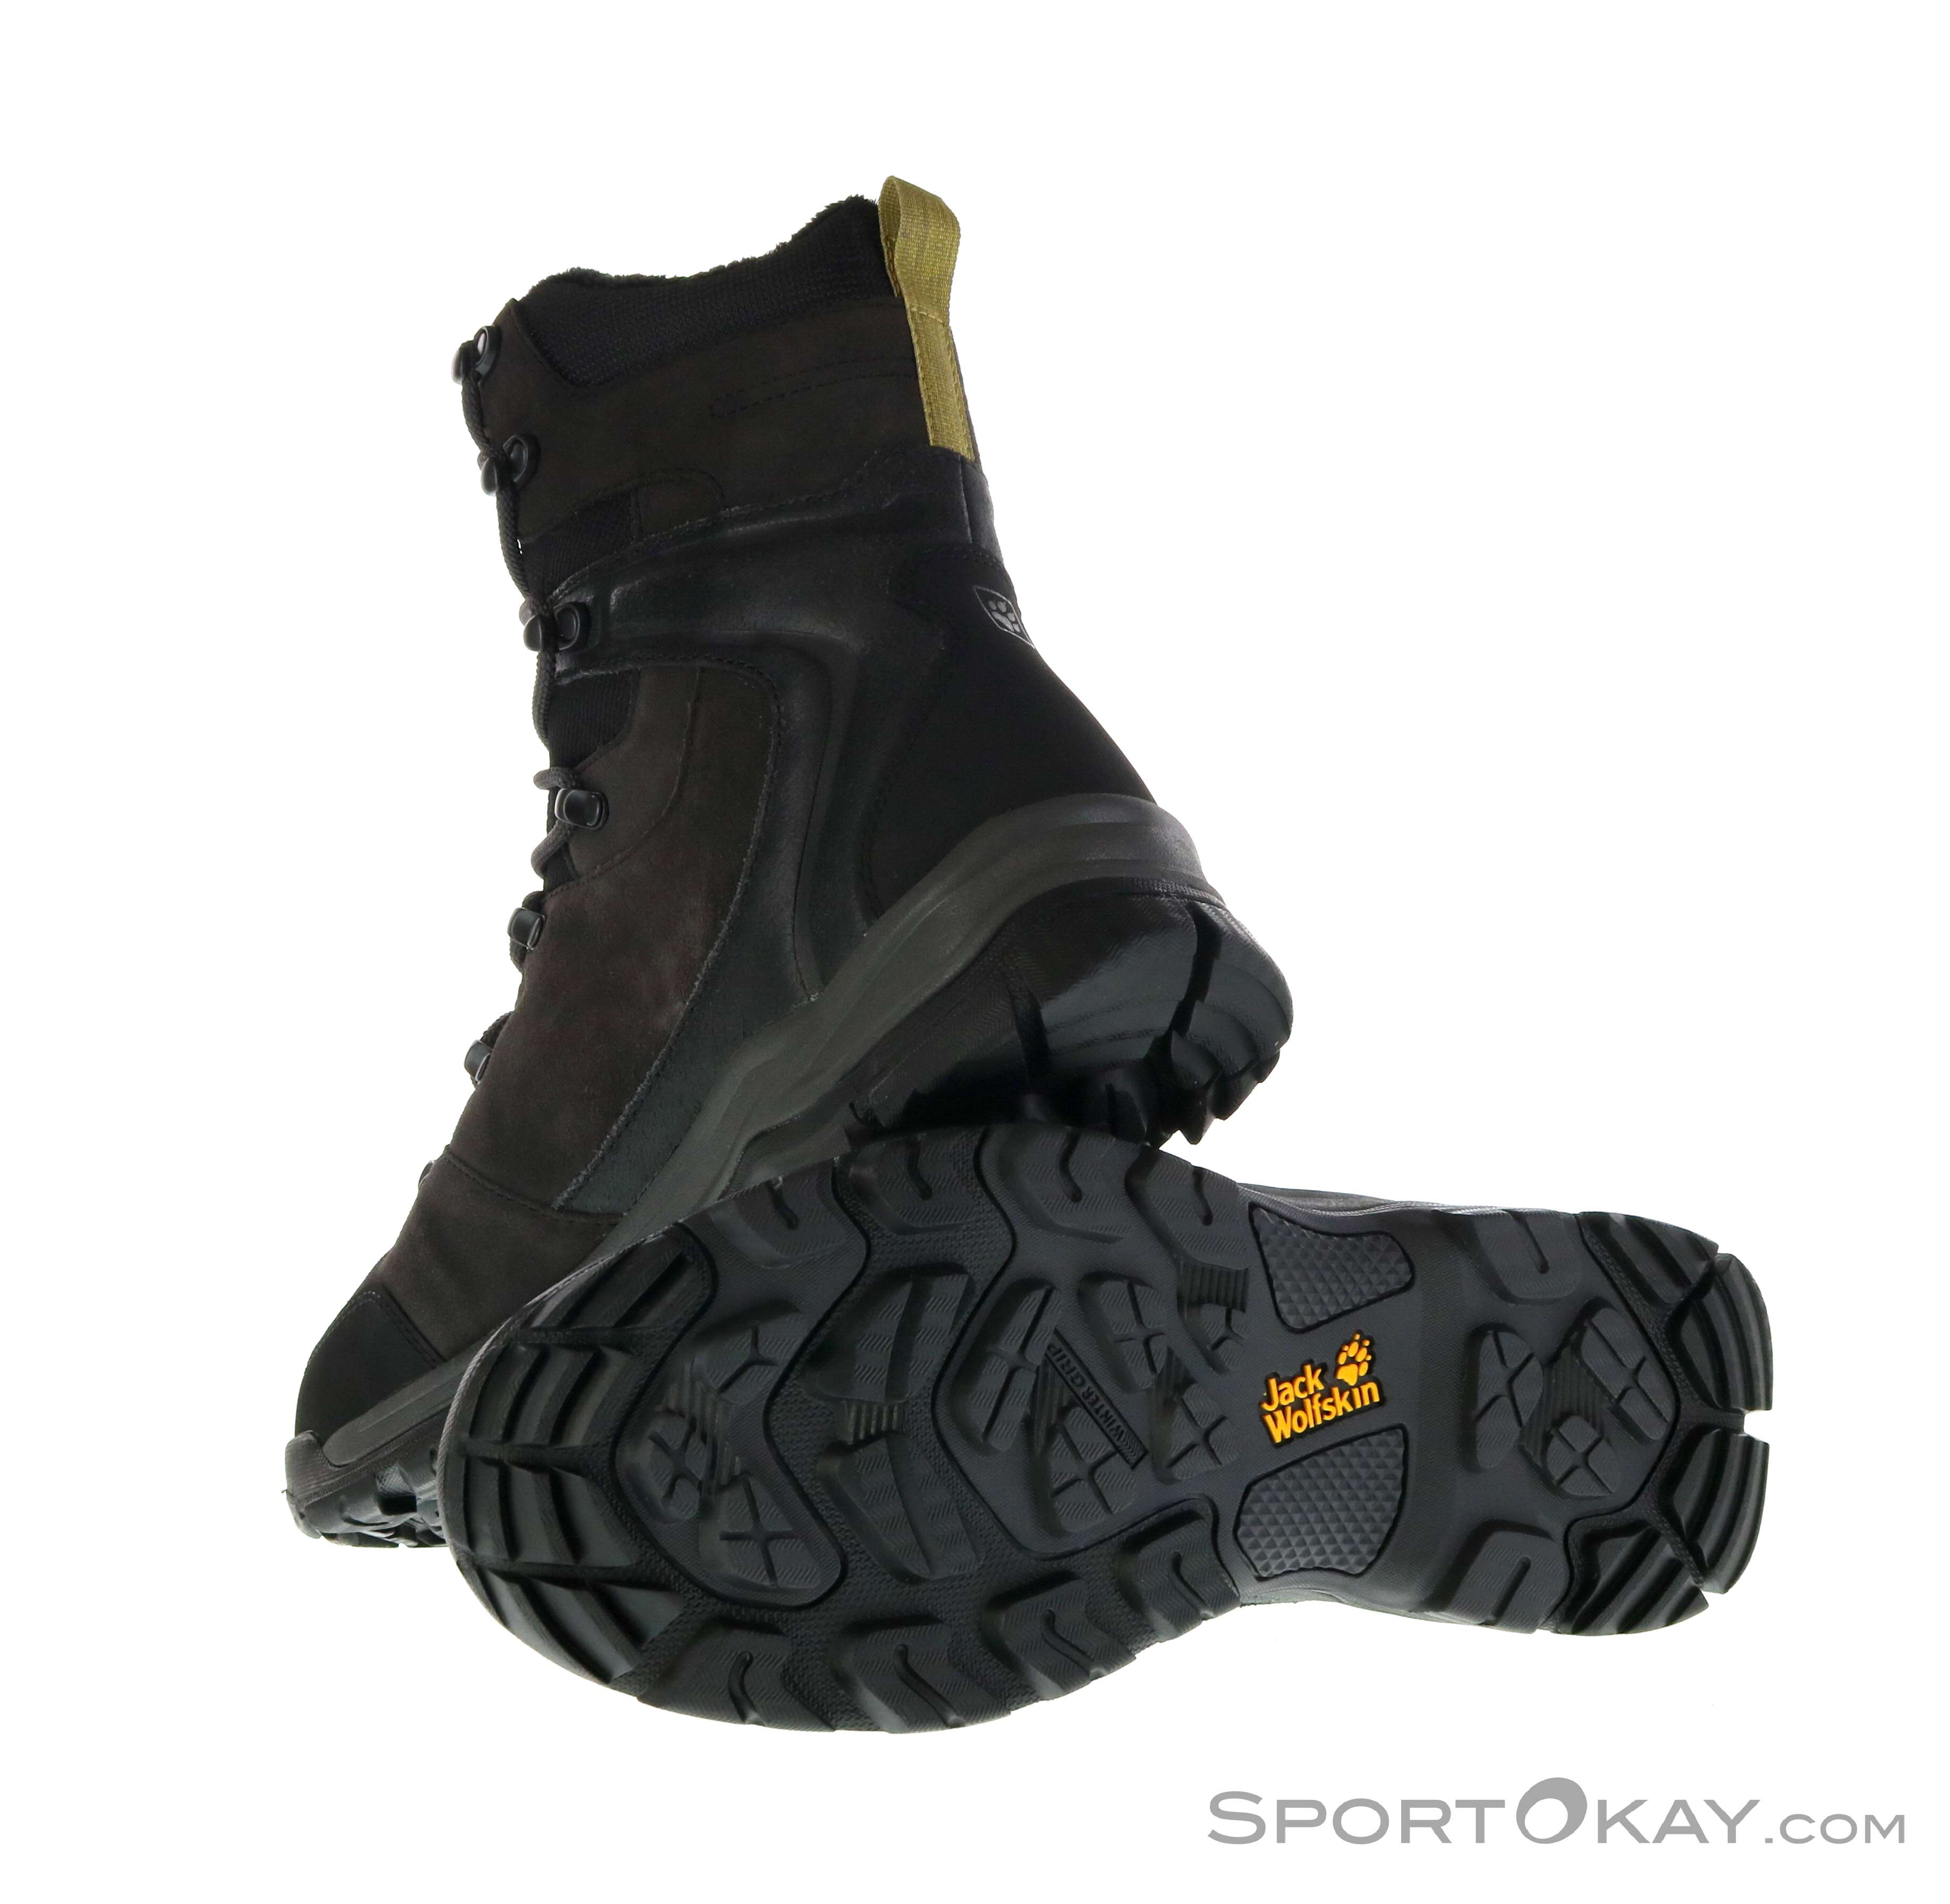 Jack Wolfskin Jack Wolfskin Glacier Bay Texapore High Mens Hiking Boots